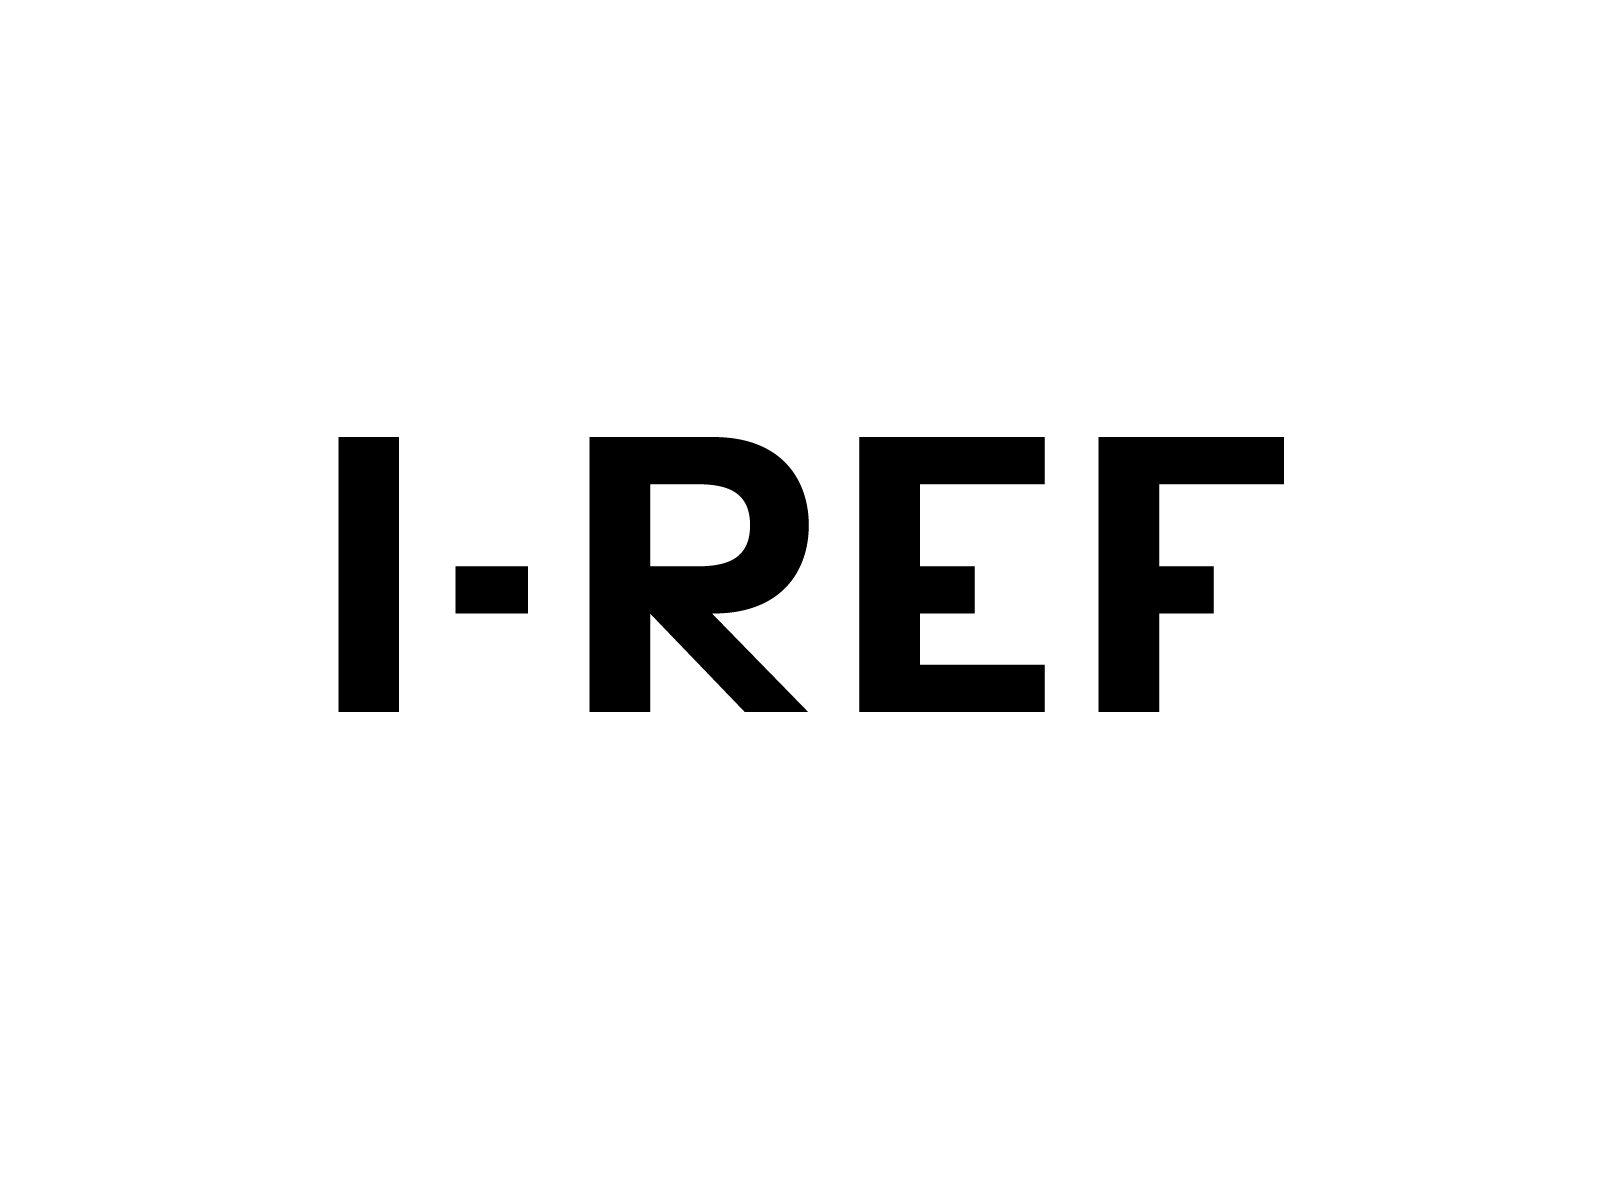 works_i-ref_logo_01